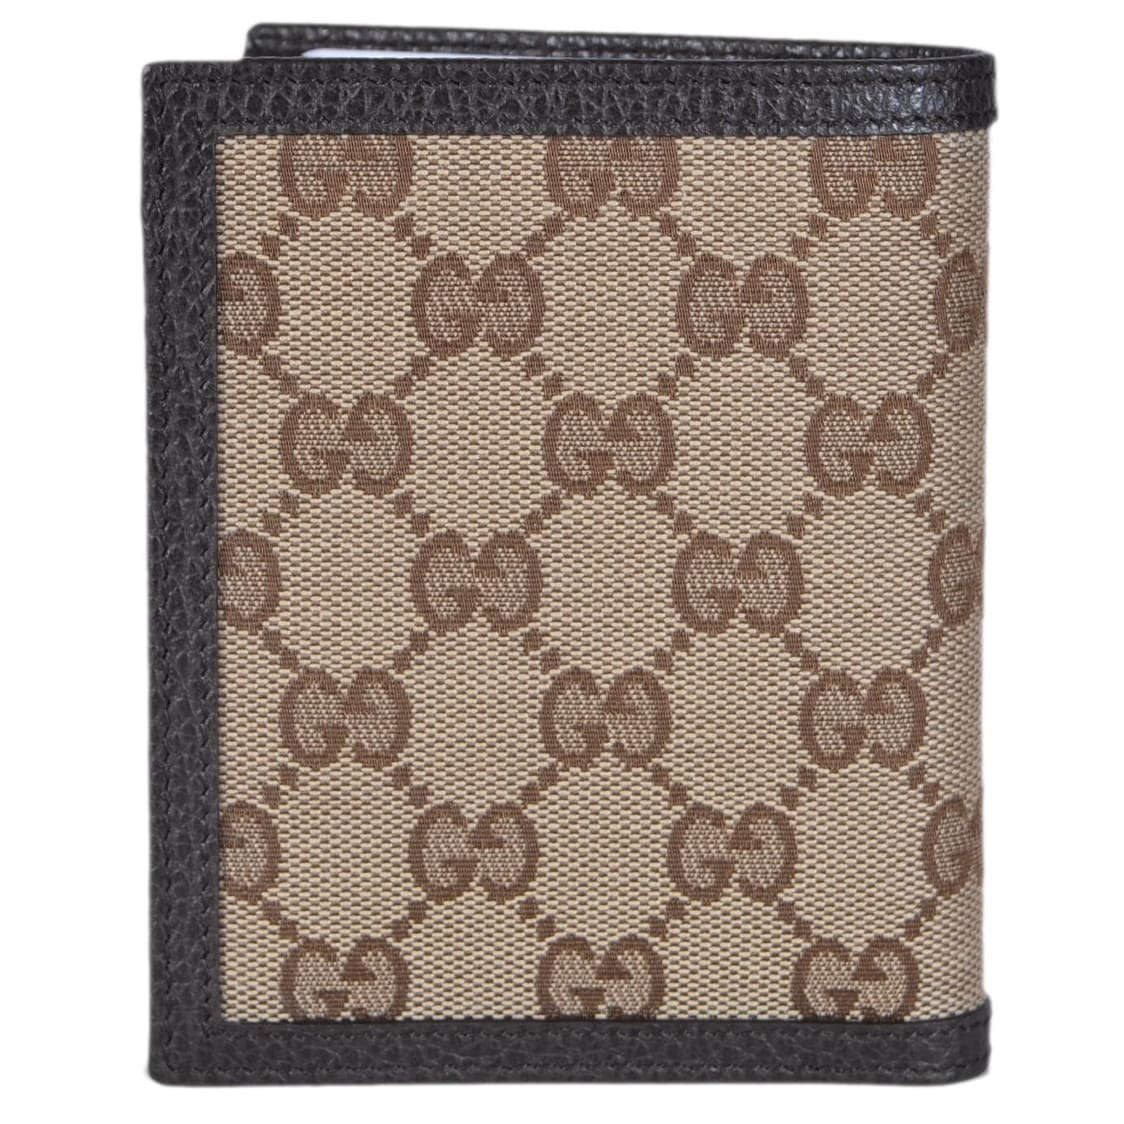 7b2d1eef520c Gucci 292533 Men's Beige Canvas GG Guccissima Vertical Bifold Wallet -  Brown - 3 7/8